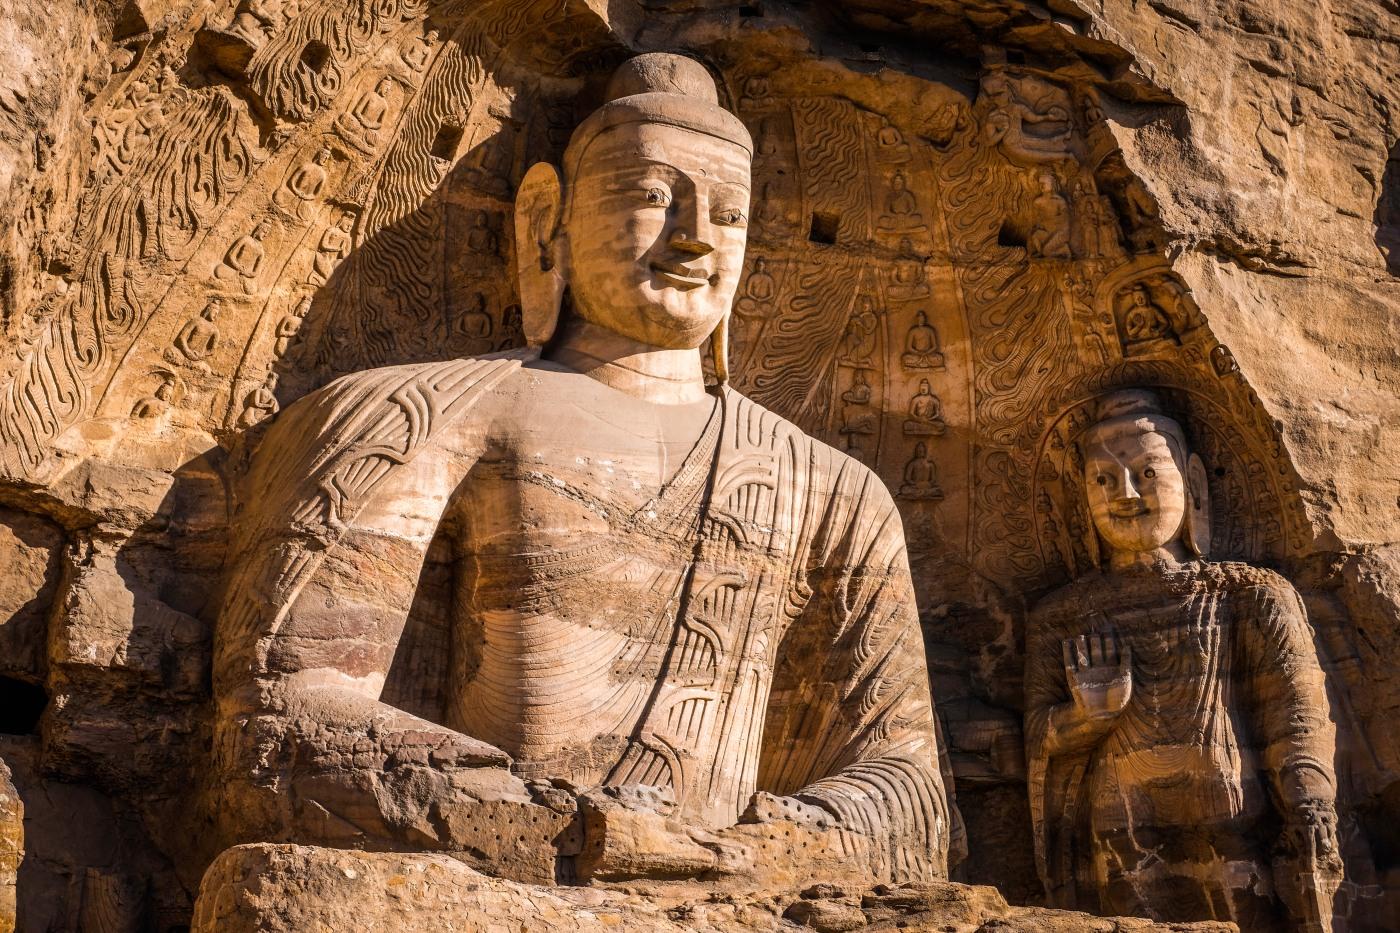 Exploring the Yungang Grottoes in Datong